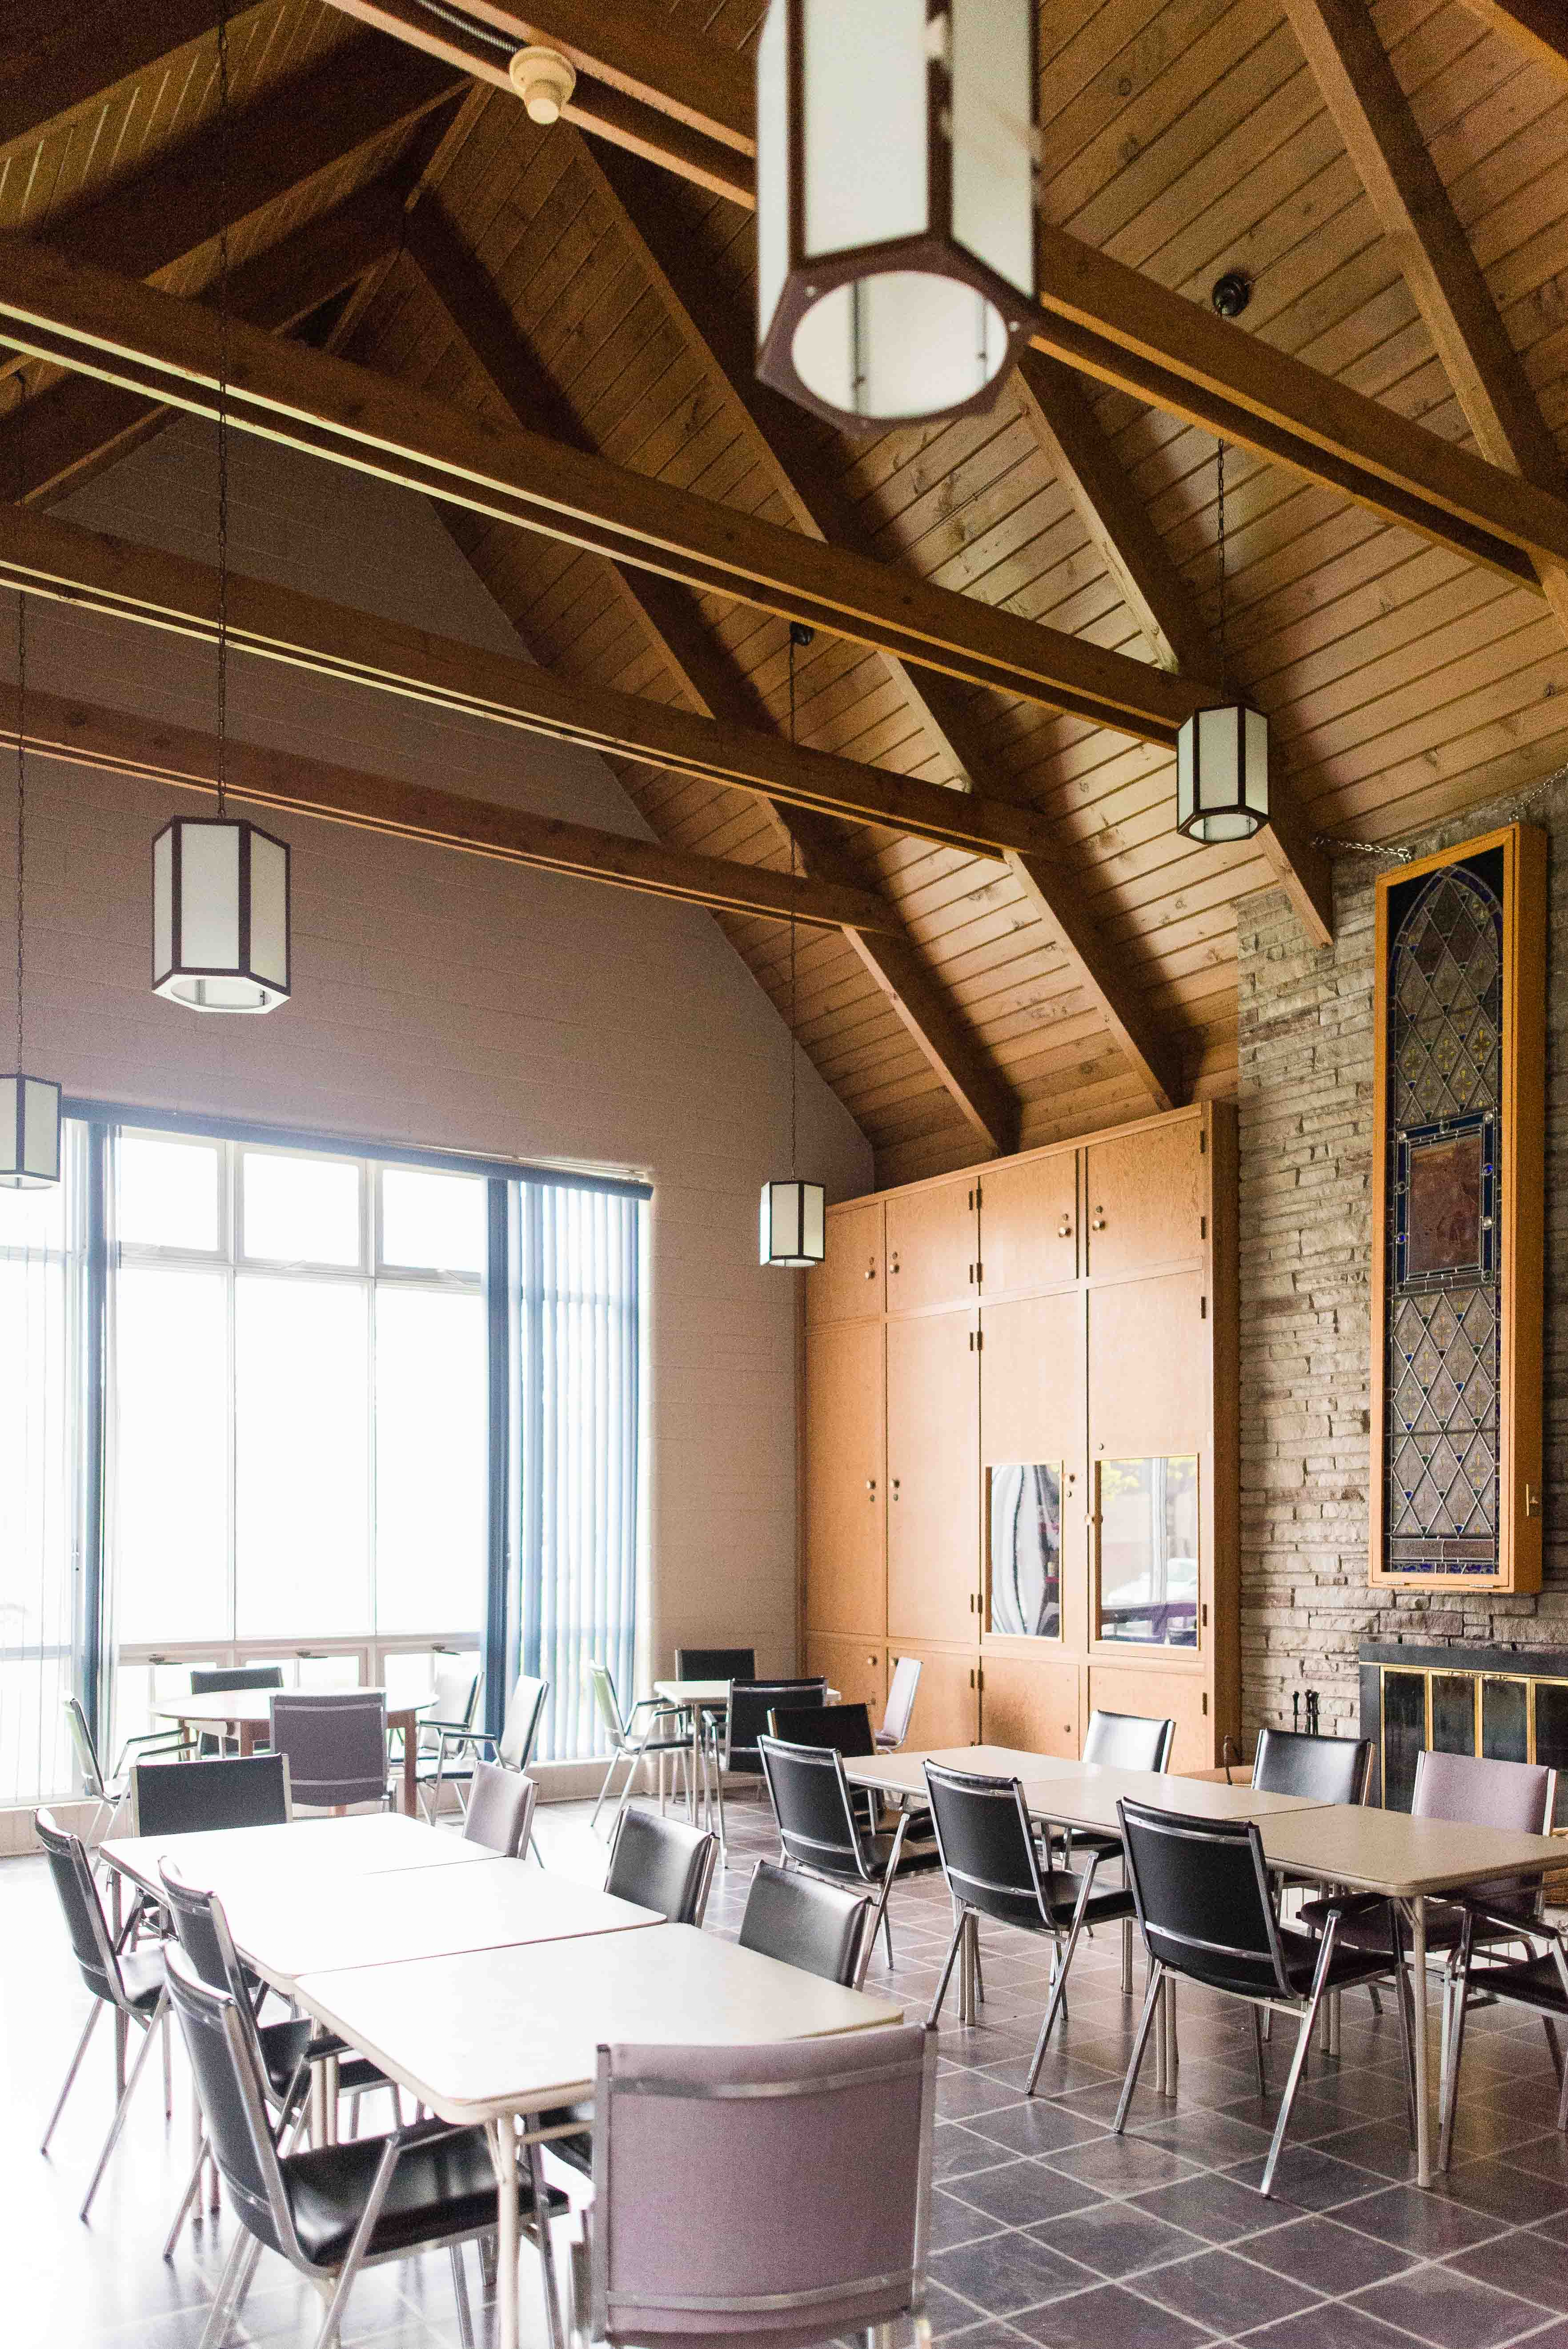 Parish hall (with fireplace)